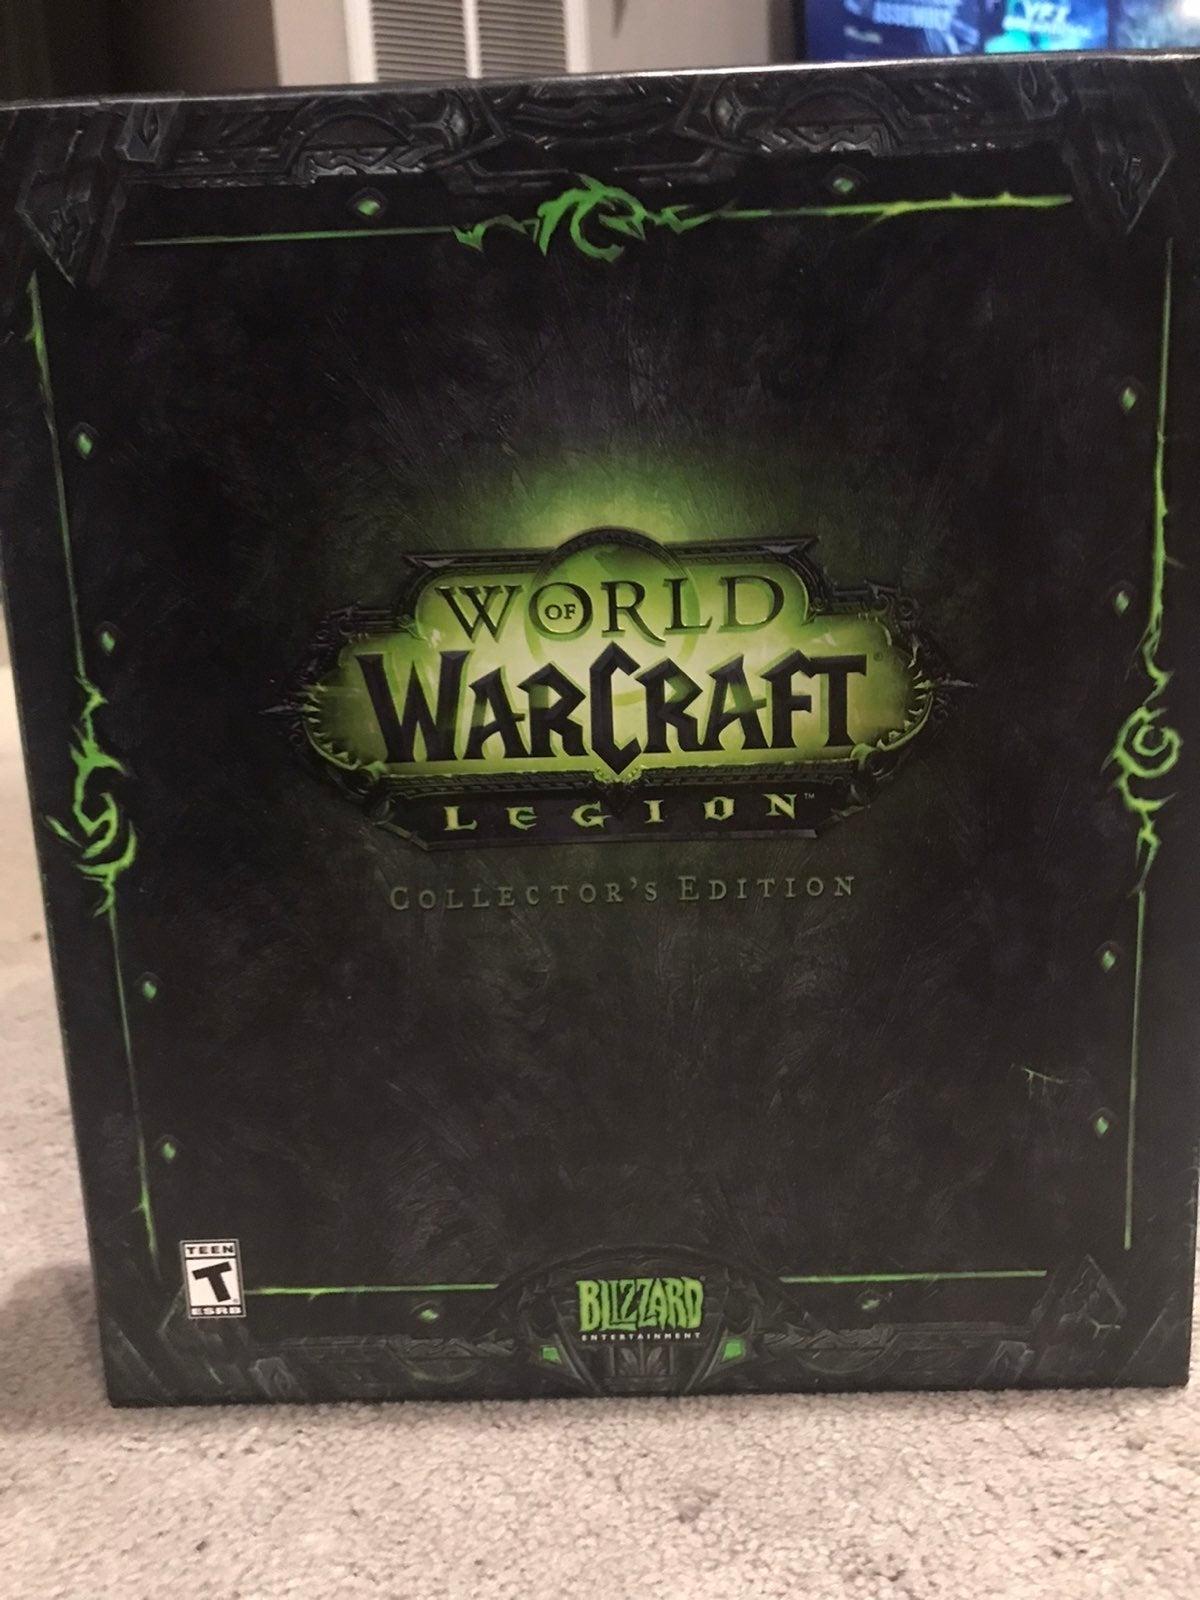 World of Warcraft: Legion CE